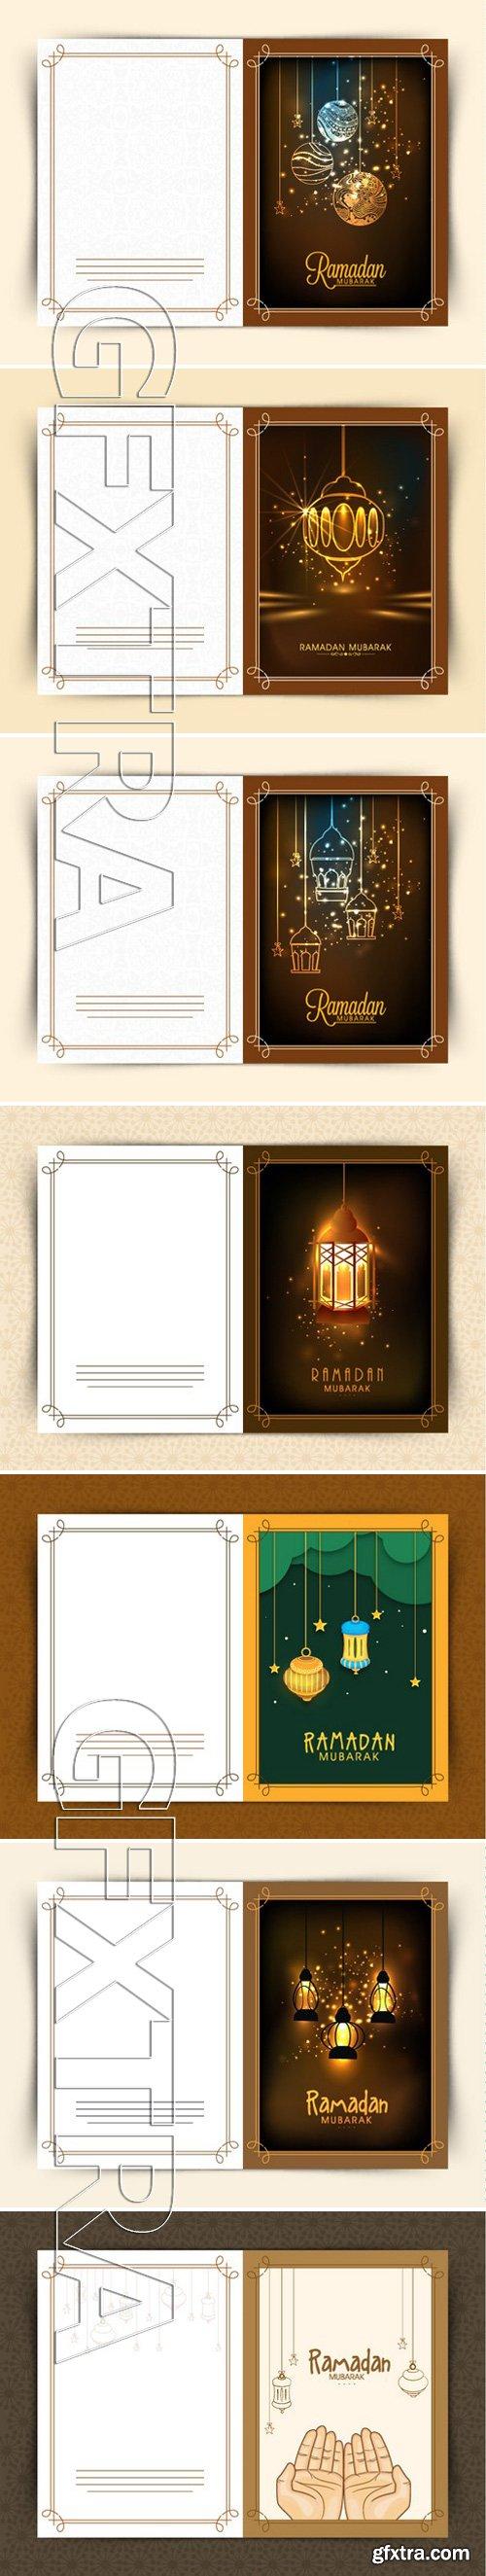 Stock Vectors - Beautiful greeting card design for Islamic holy month of prayers, Ramadan Kareem celebrations with hanging golden lanterns